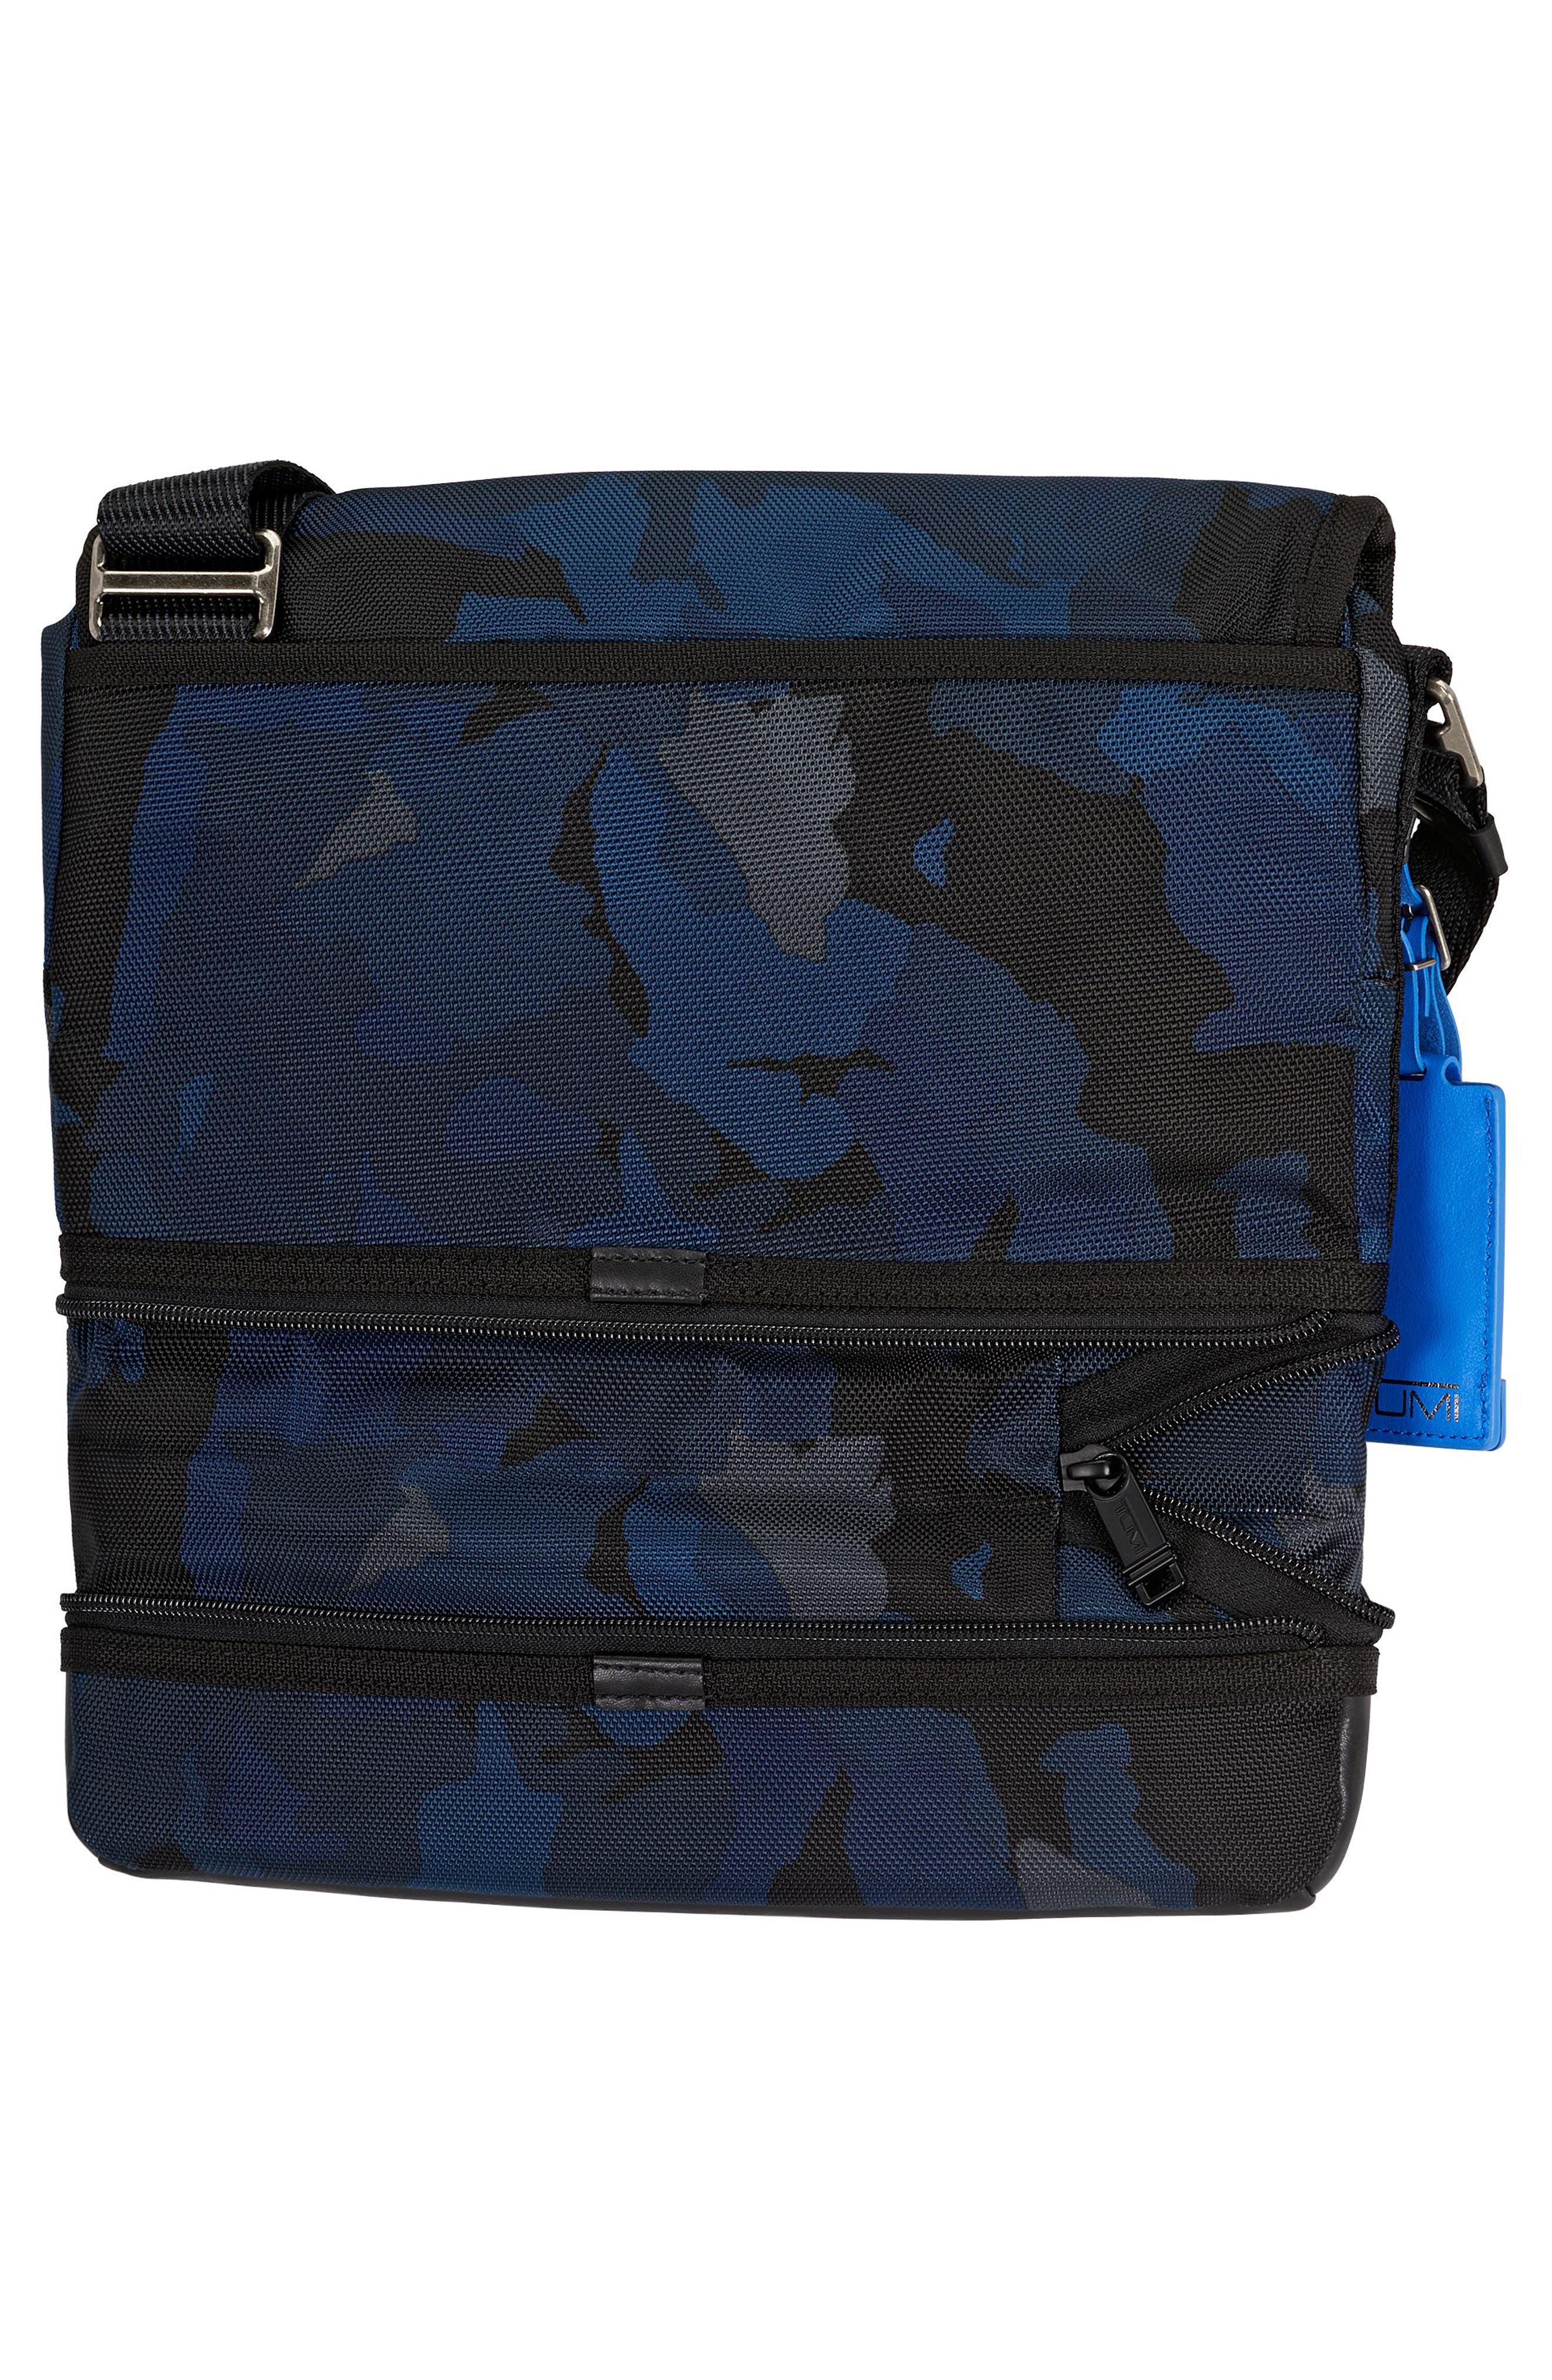 Alpha Bravo Beale Messenger Bag,                             Alternate thumbnail 3, color,                             Blue Camo